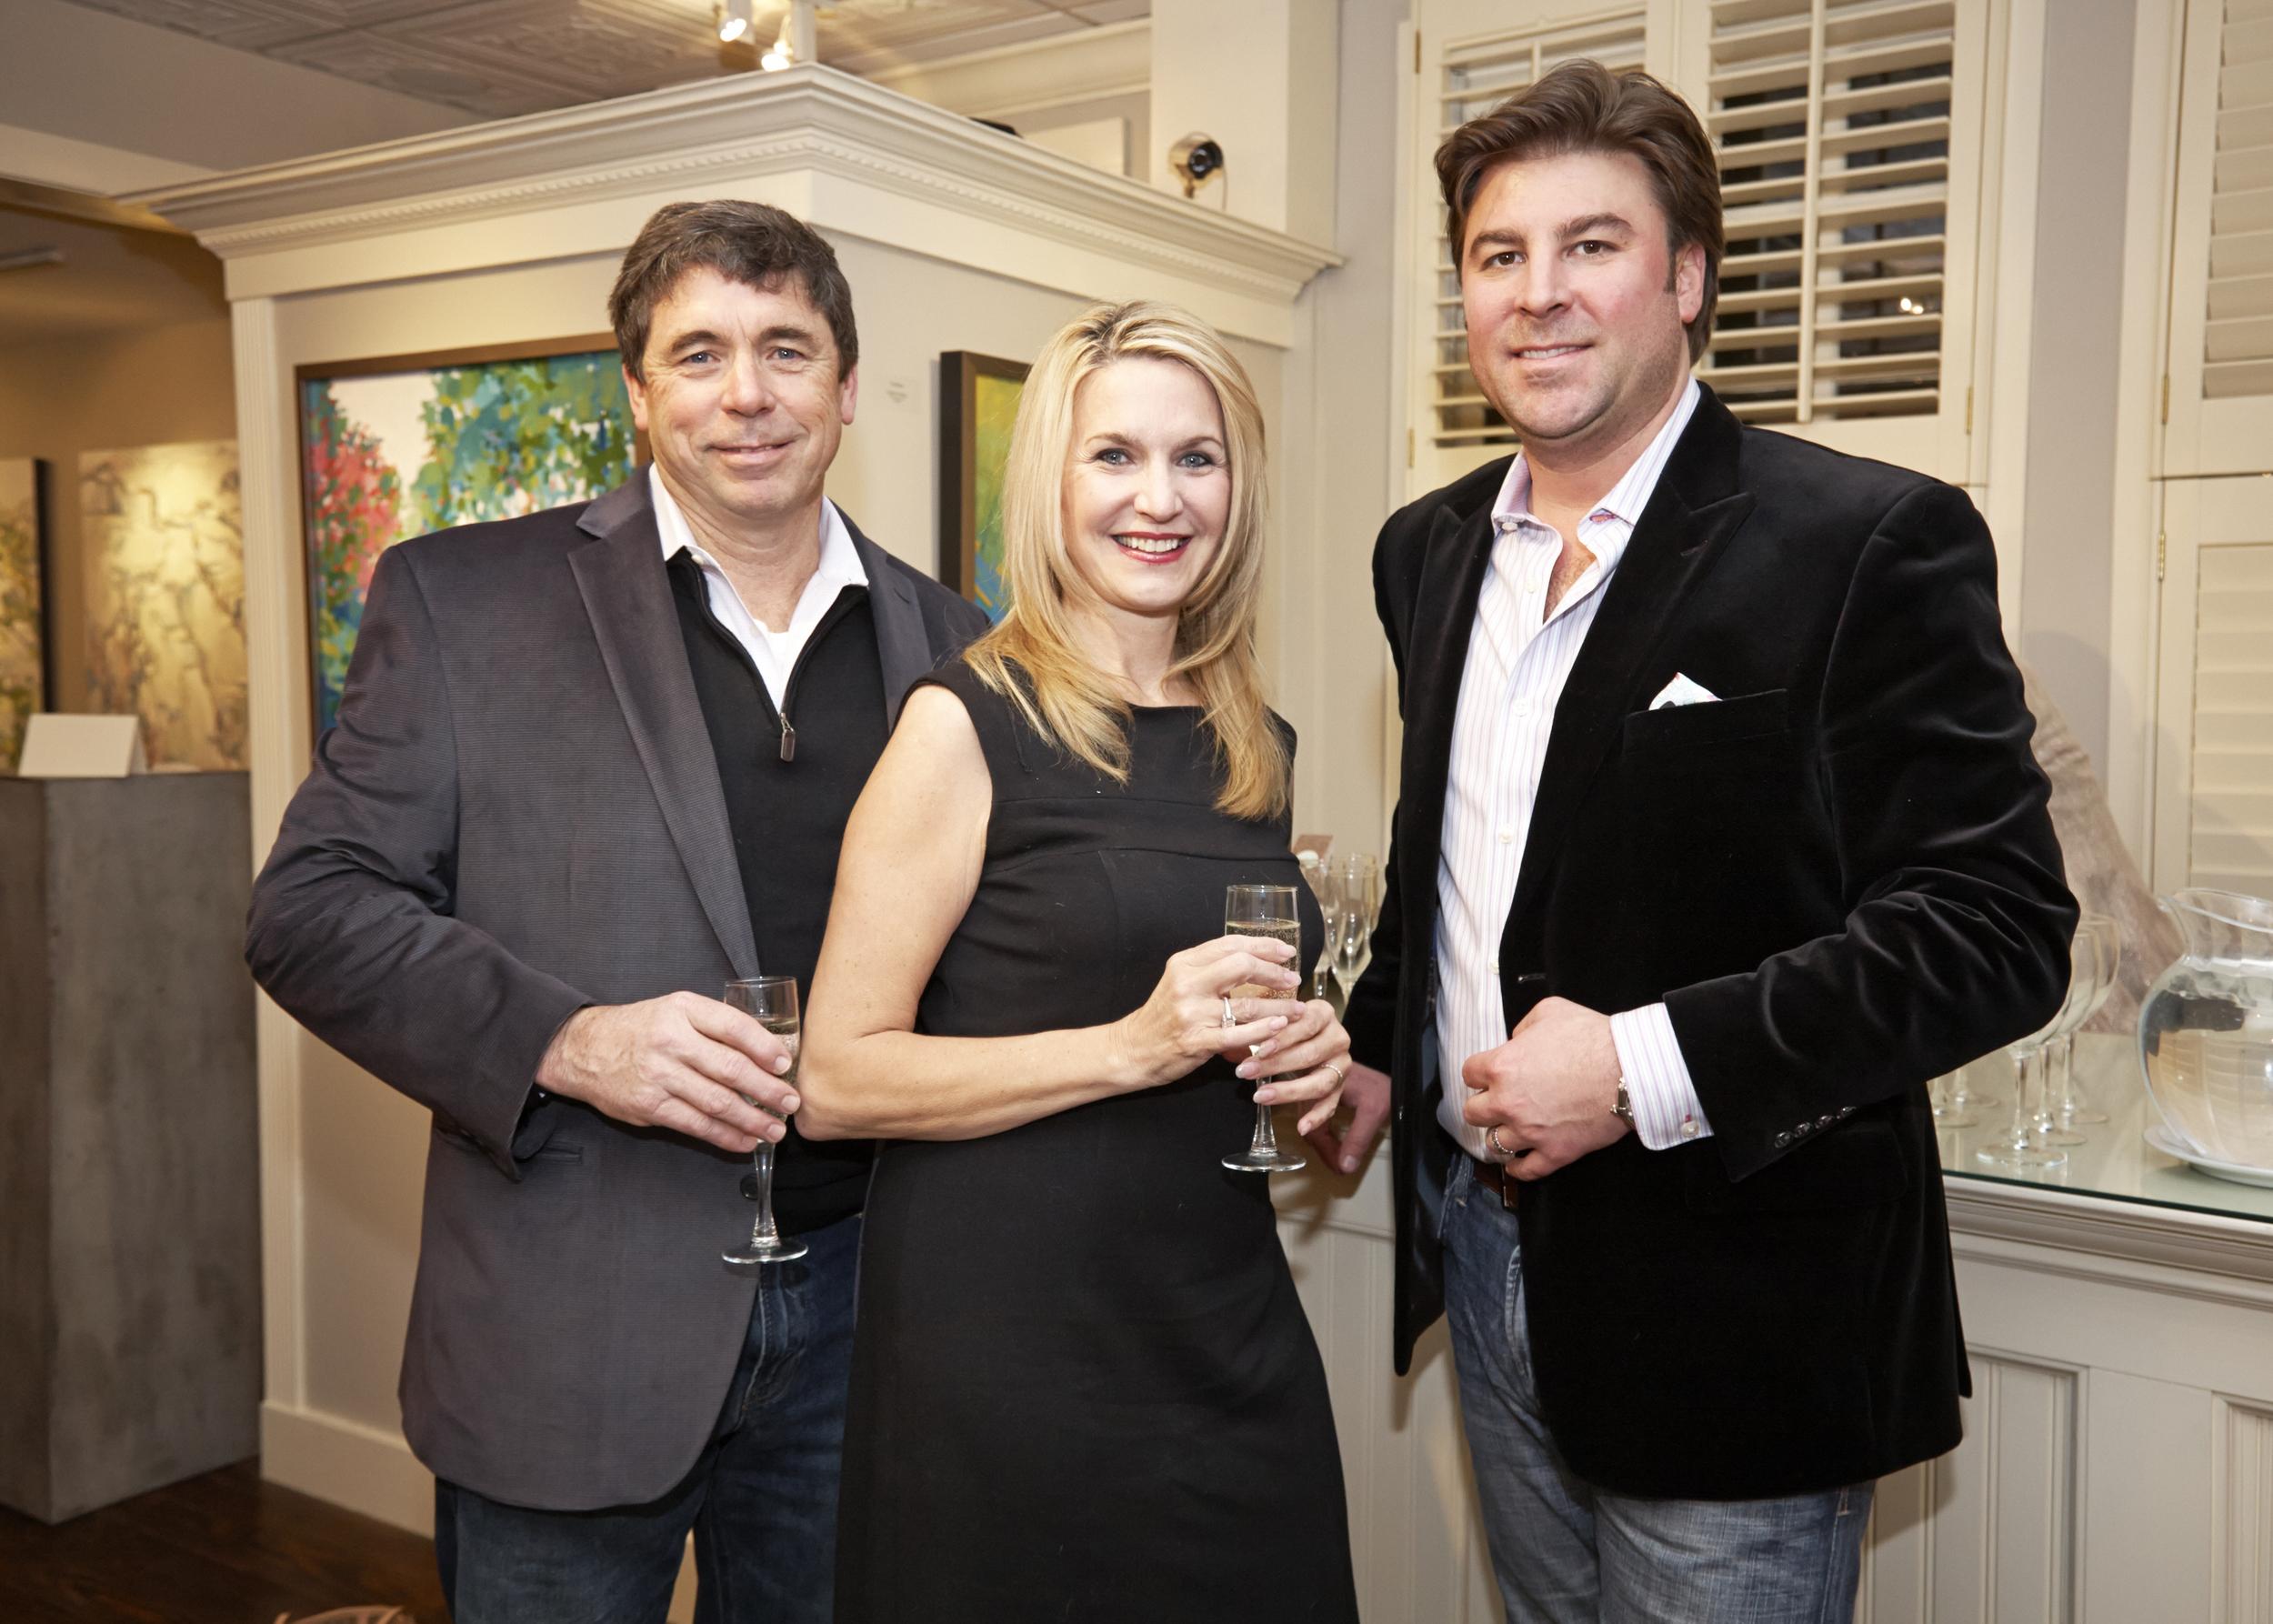 Designer Private Preview Party_ Gordon and Jan Hiltz and Michael Larock.jpg